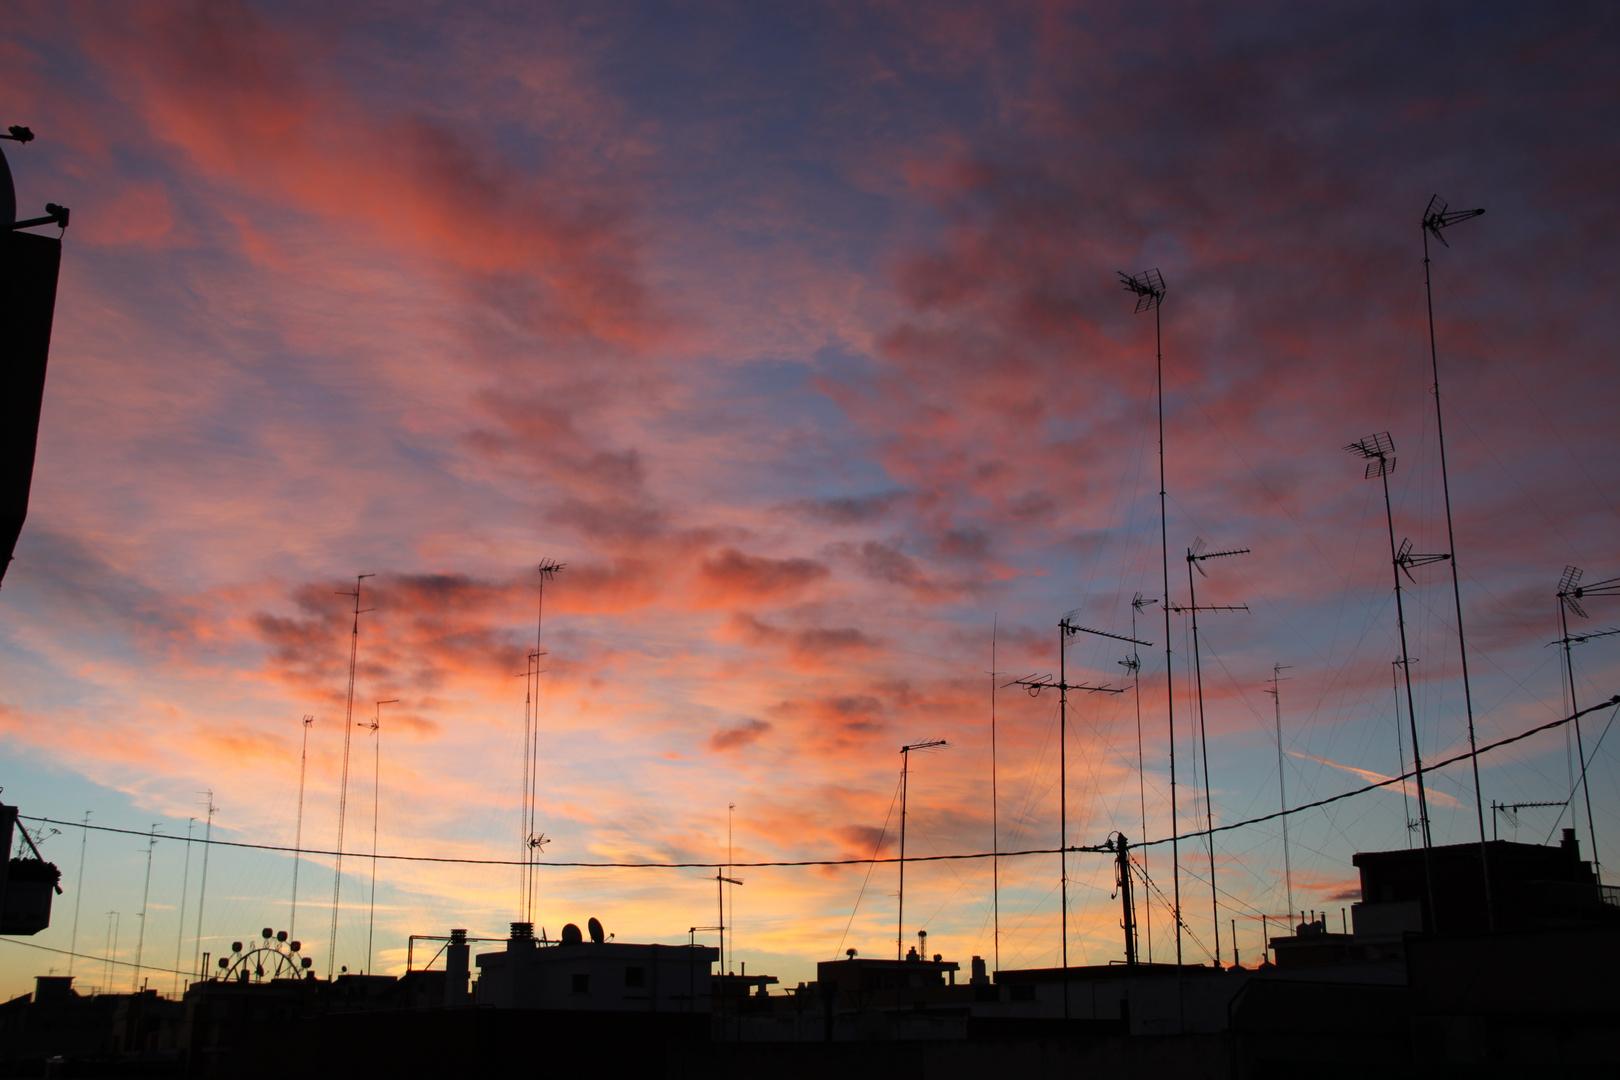 Amanecer redondo. Puerto de Valencia, 6 de Diciembre 2012 8:20 AM